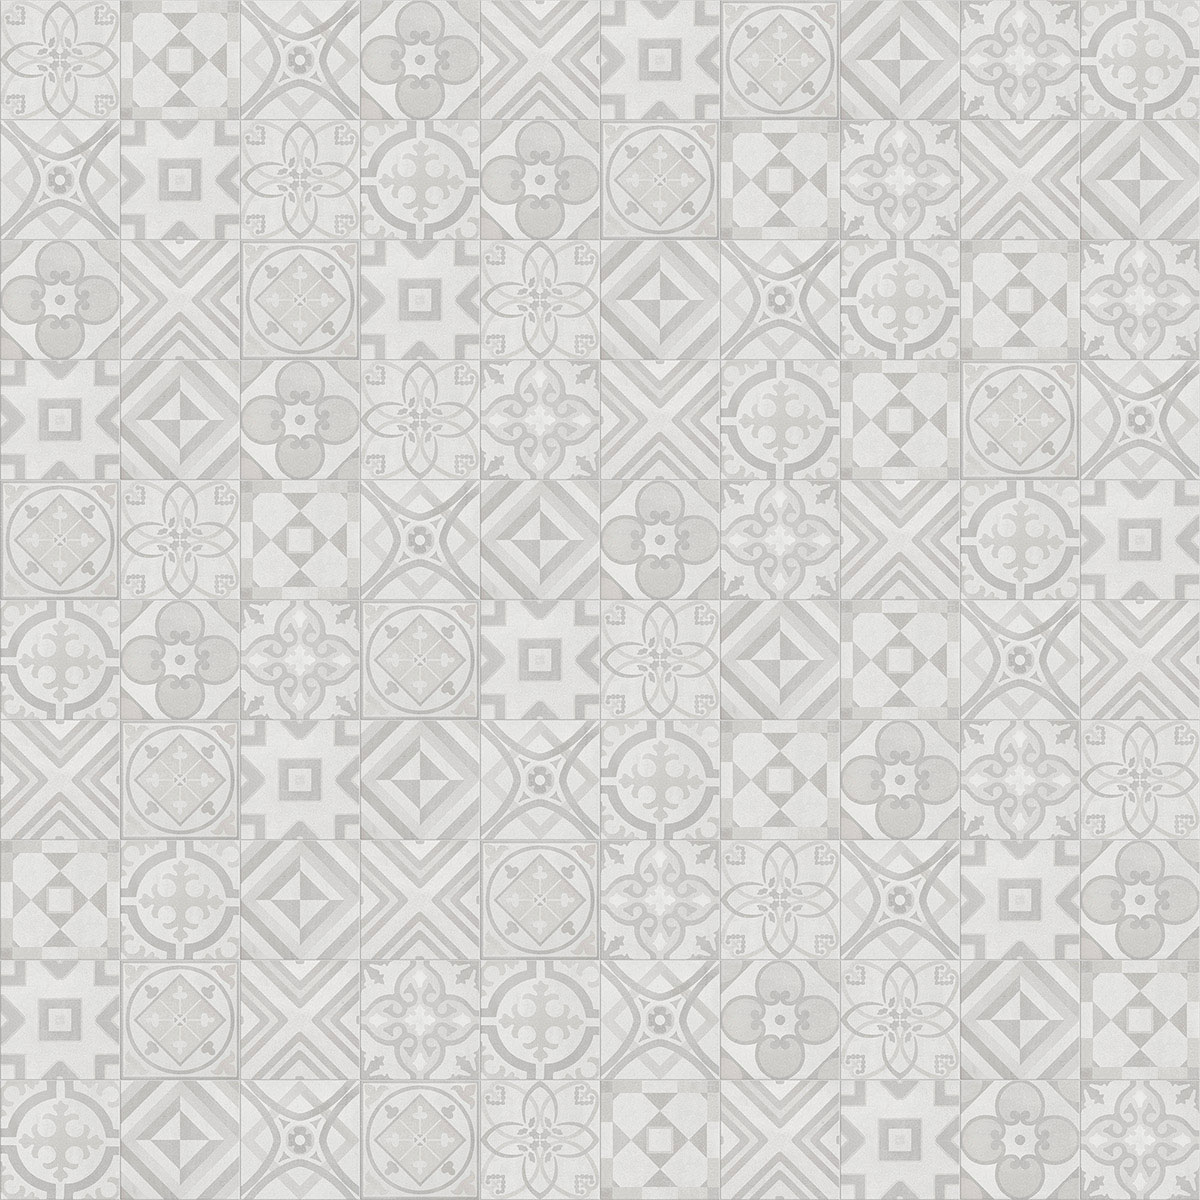 Marrakesh Design. Excellent With Marrakesh Design. Best